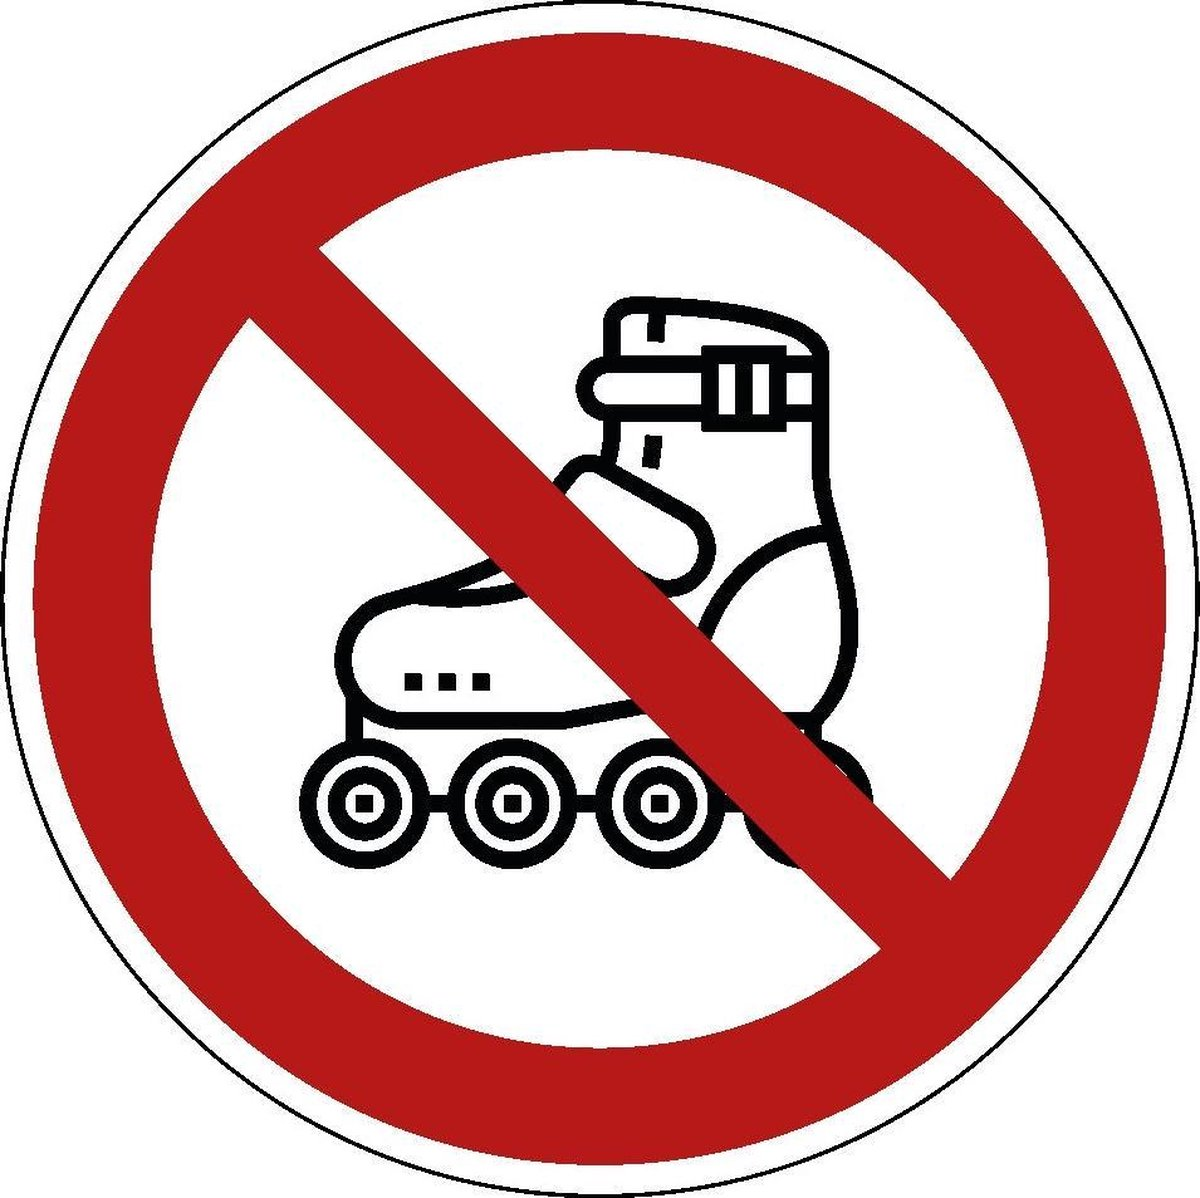 Verboden te skaten sticker 400 mm